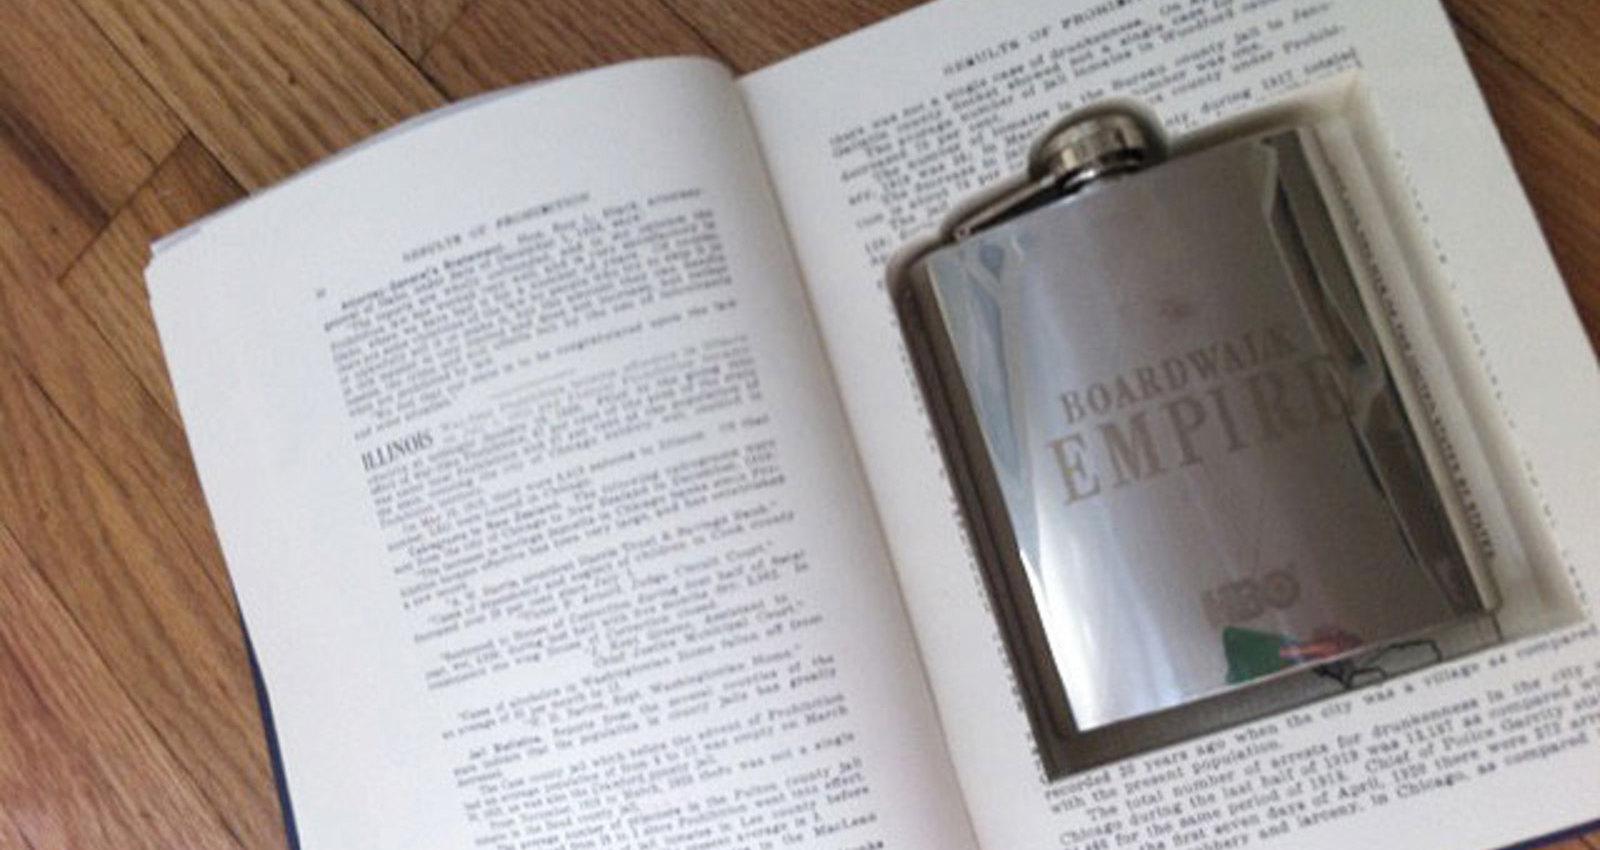 Boardwalk Empire - Book Safe Hip Flask